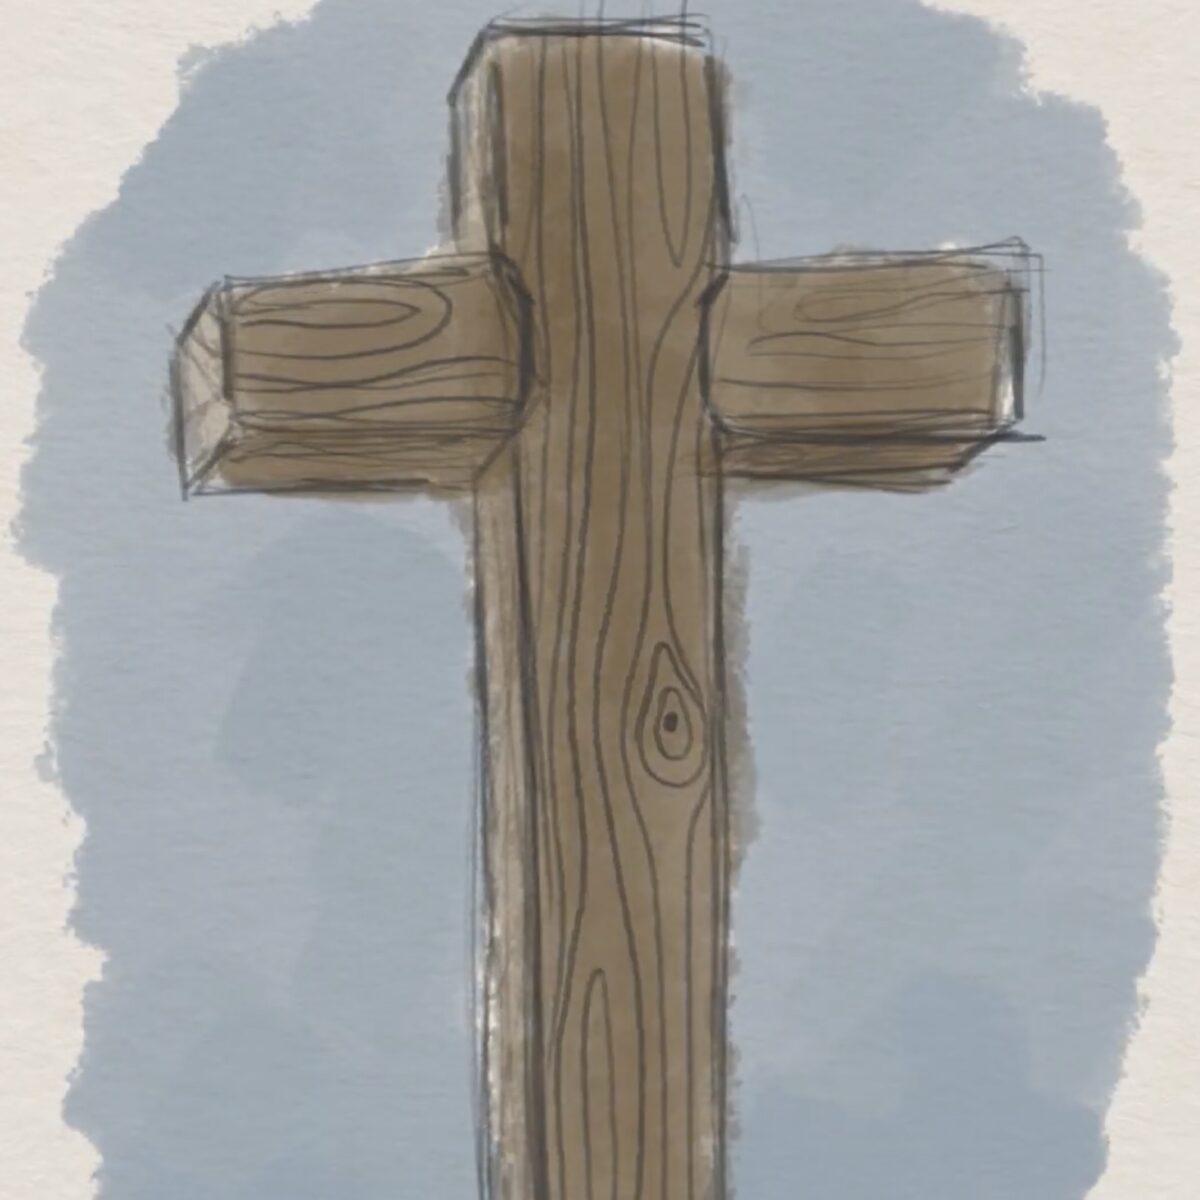 Illustrated wooden cross